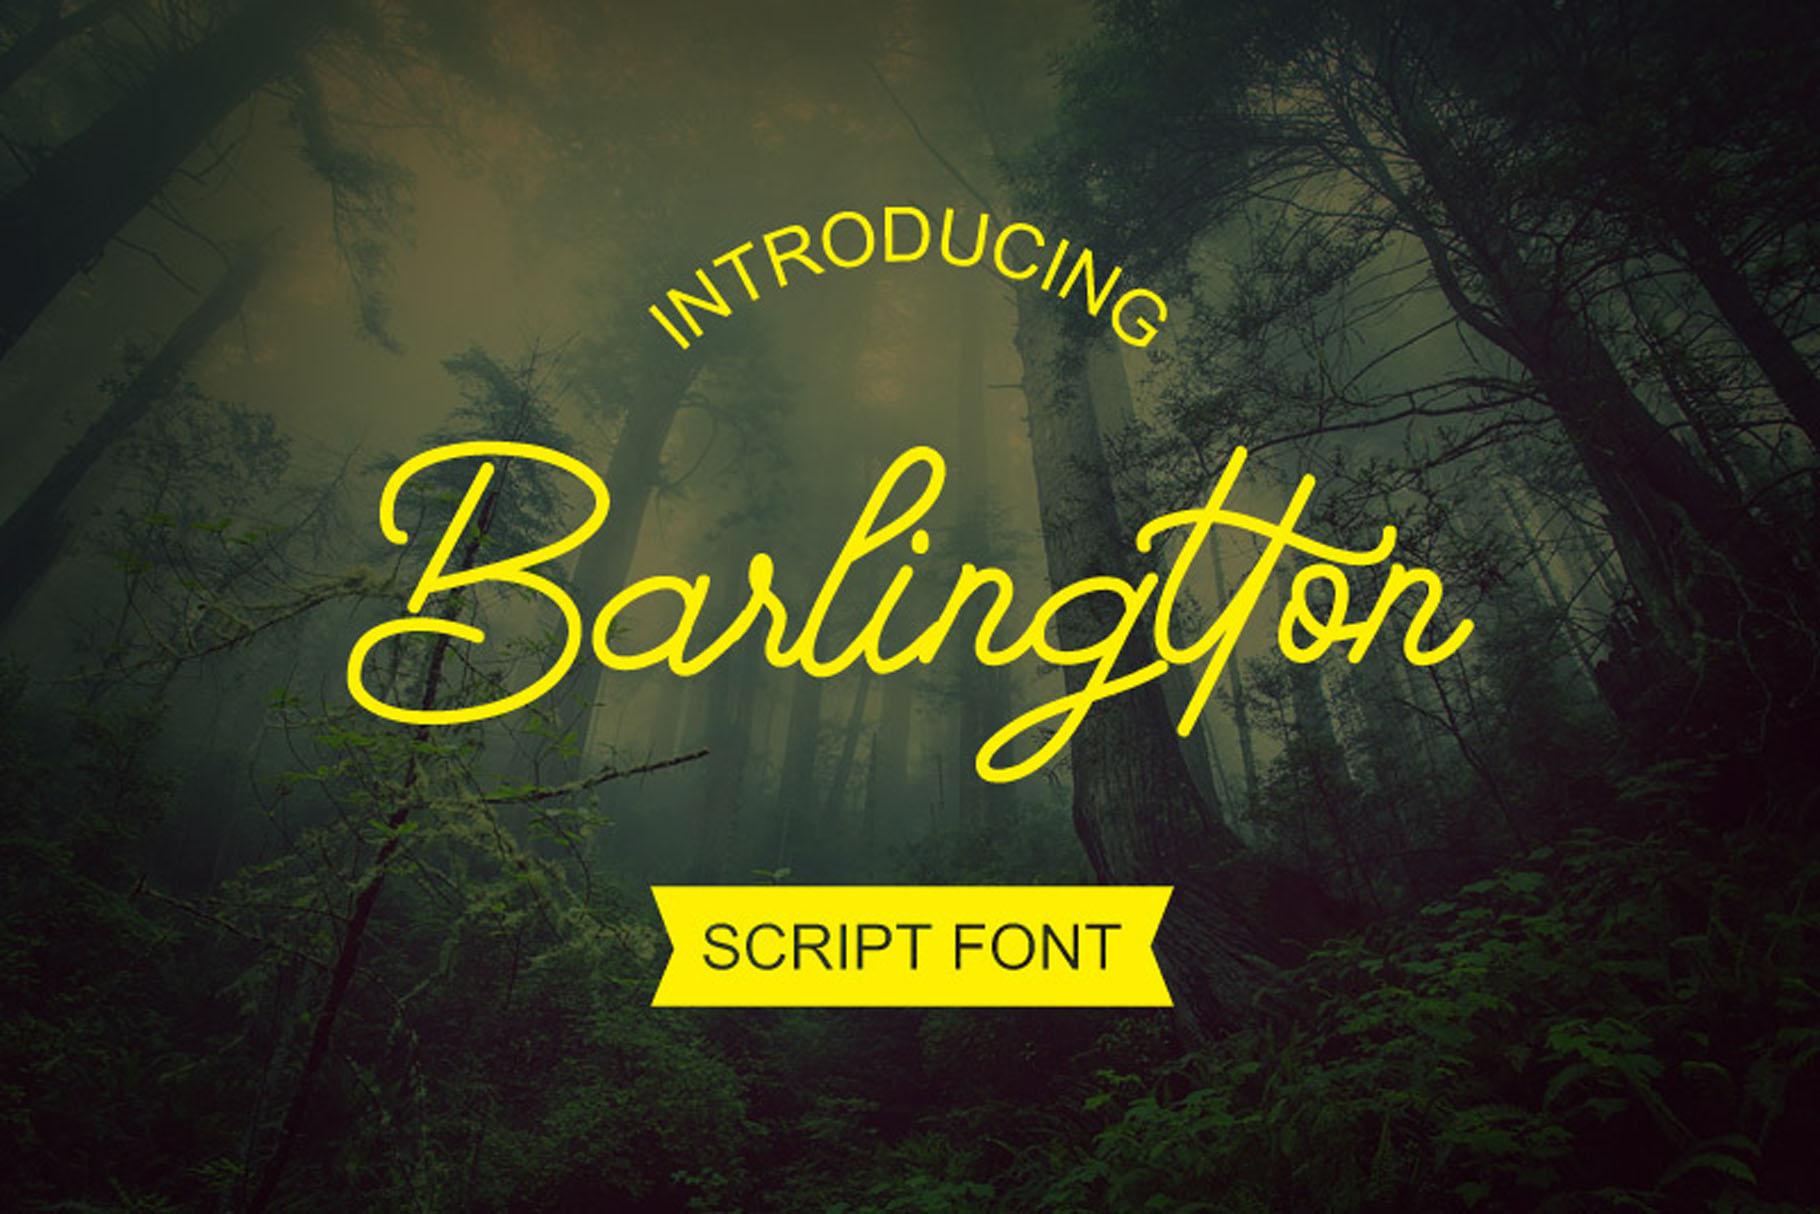 Barlingtton example image 1